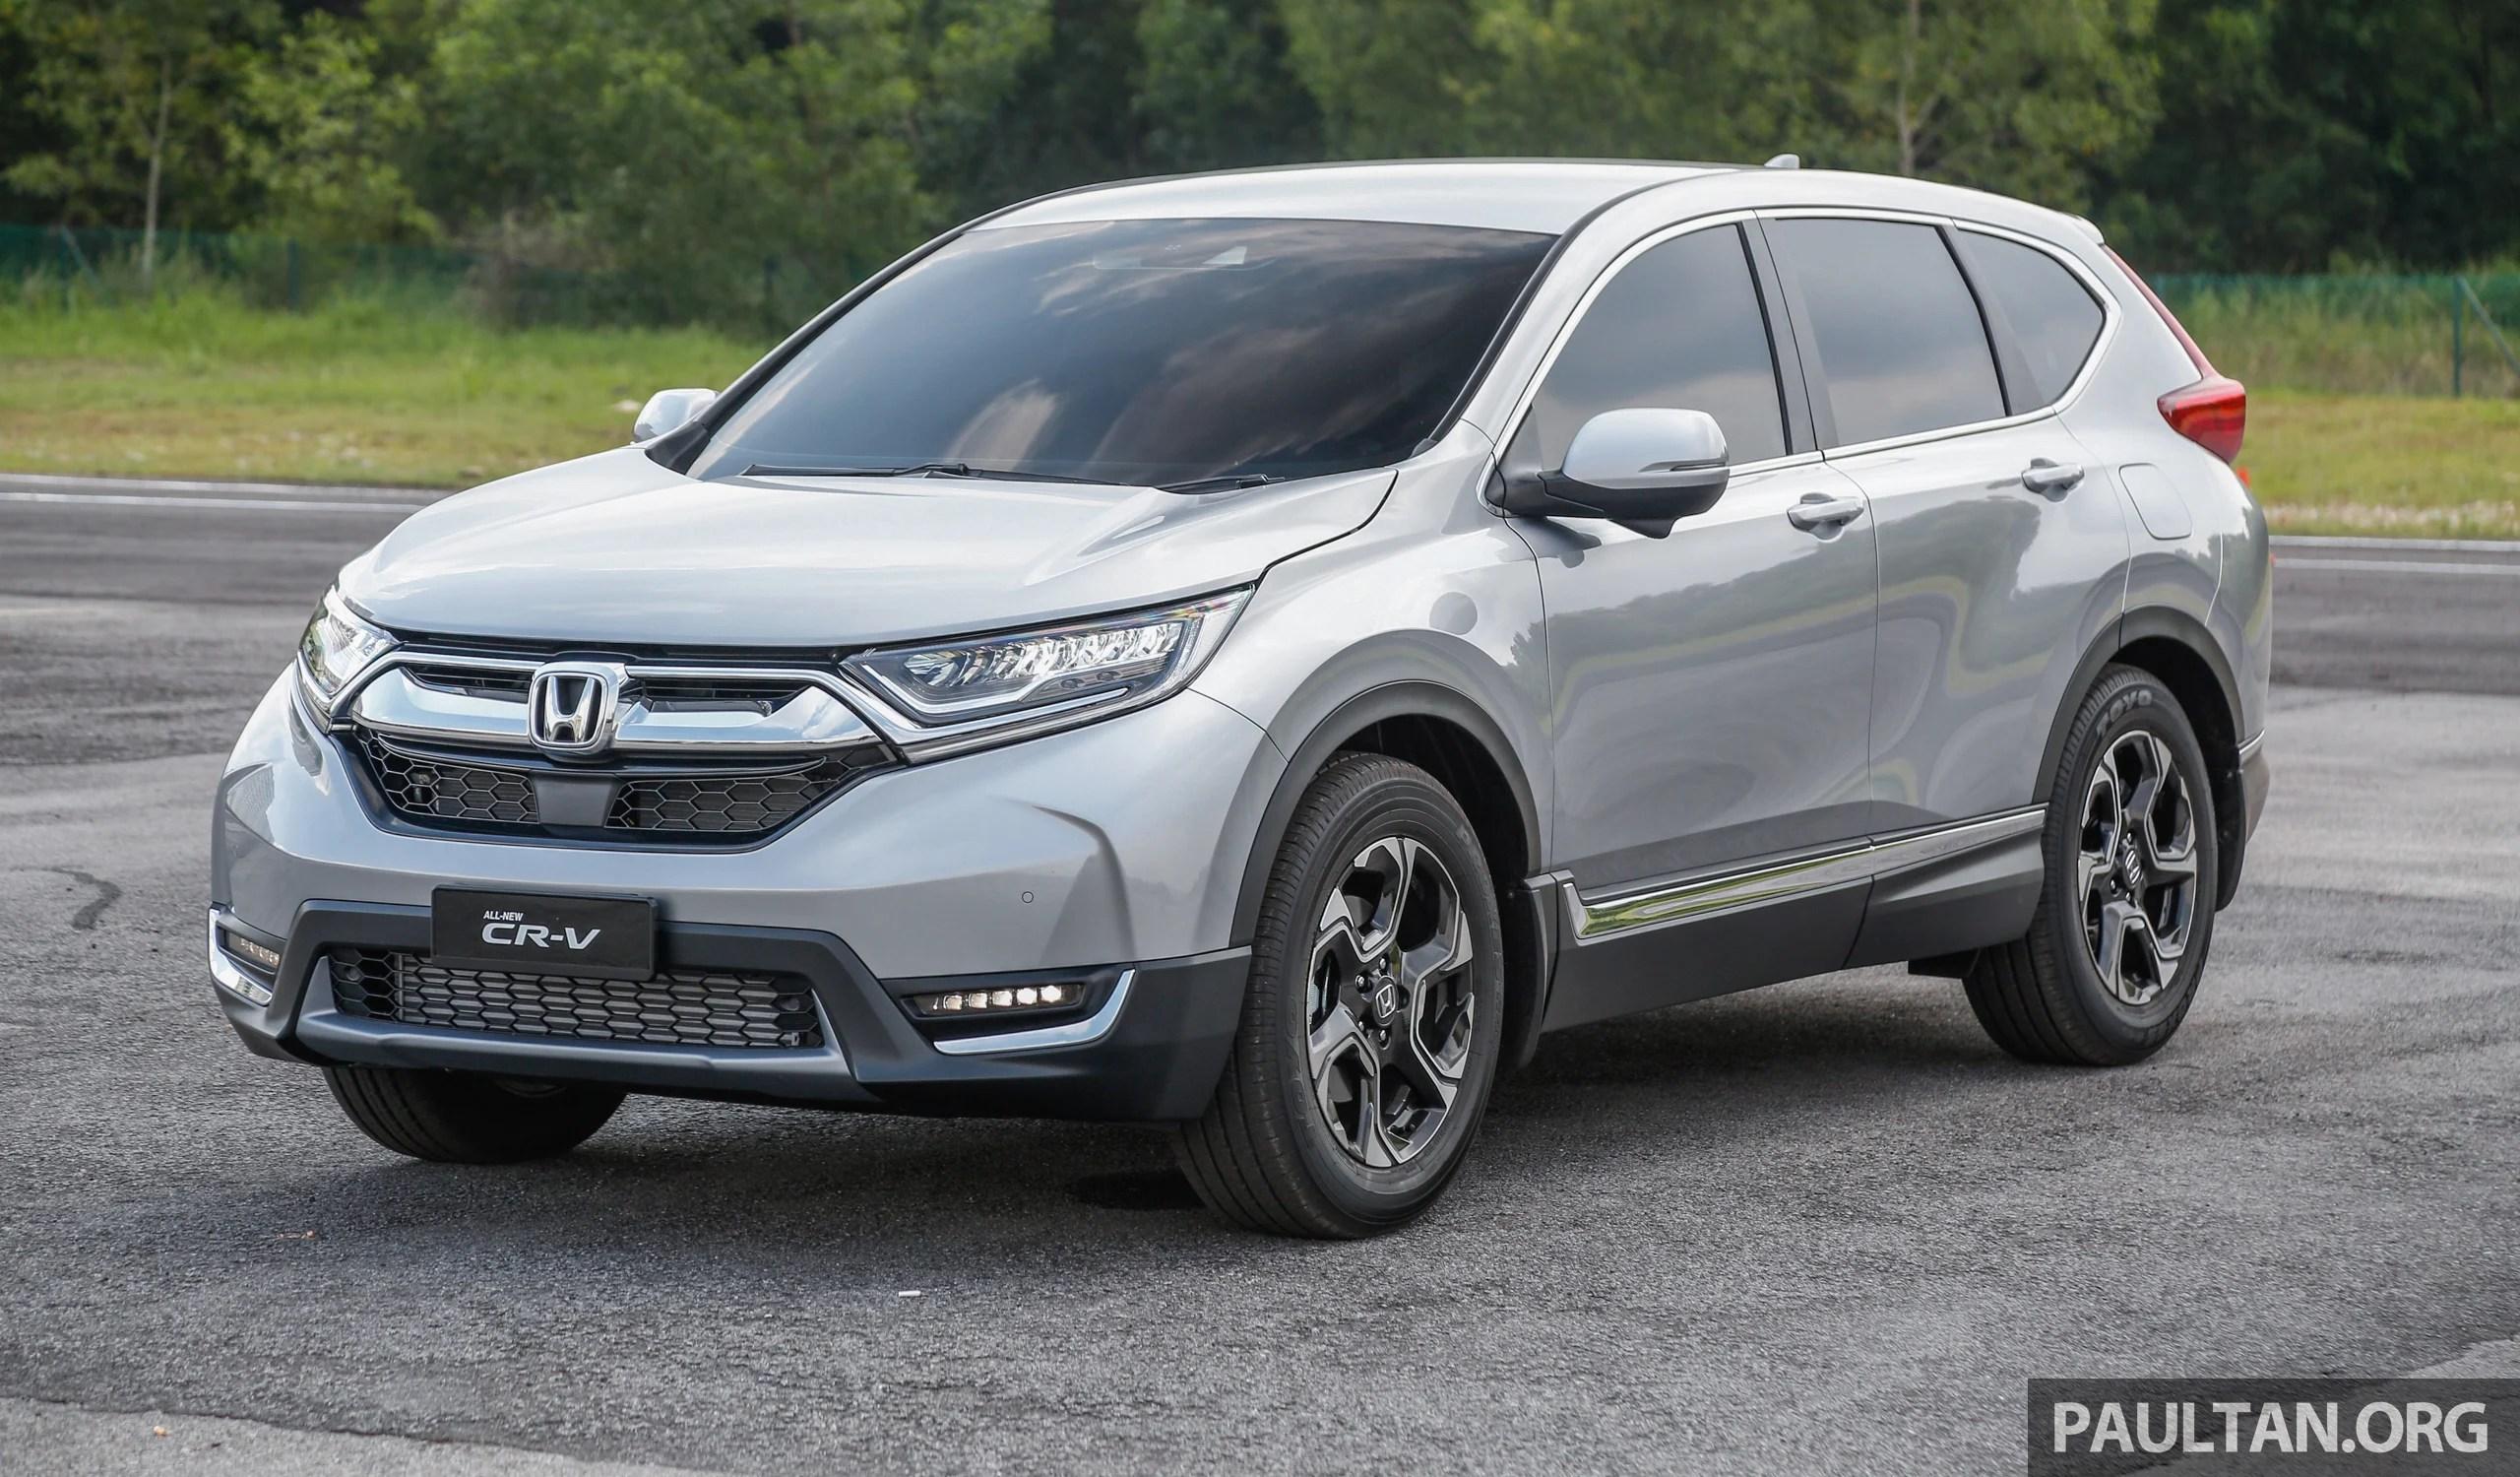 DRIVEN: 2017 Honda CR-V with Honda Sensing - first impressions review